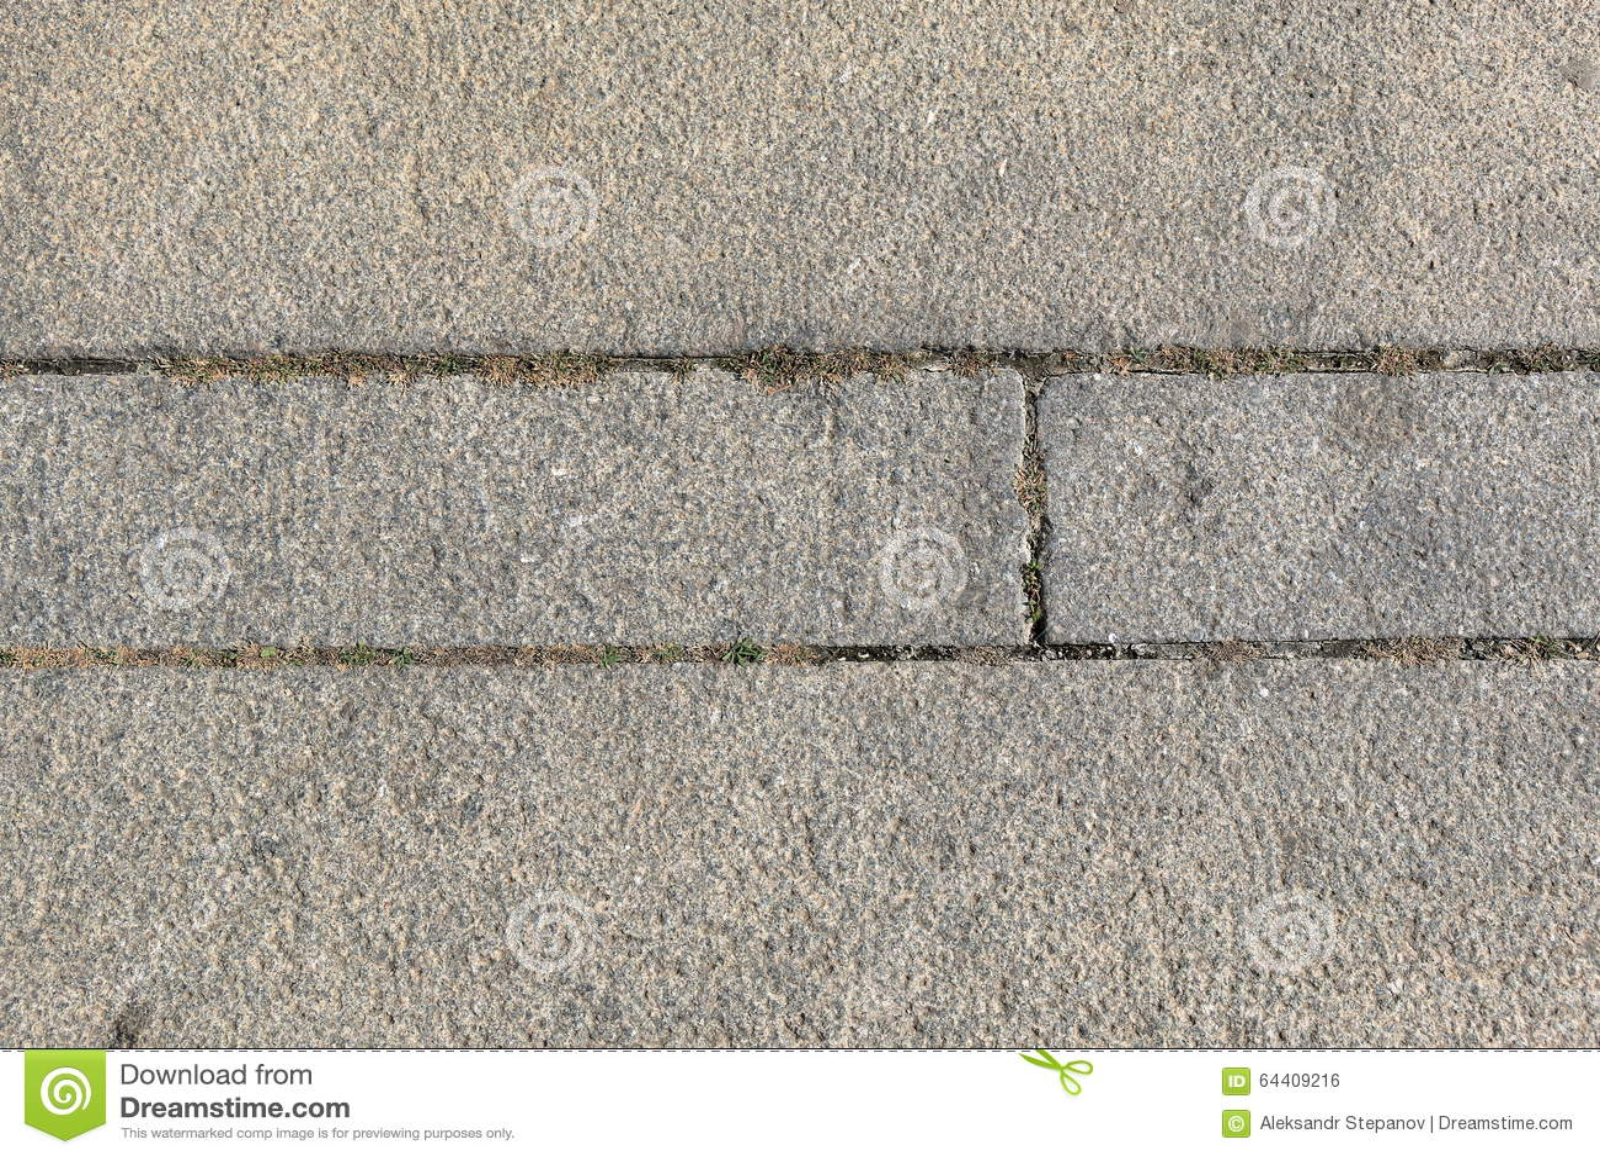 Rough Granite Block : Rough granite blocks with grass stock photo image